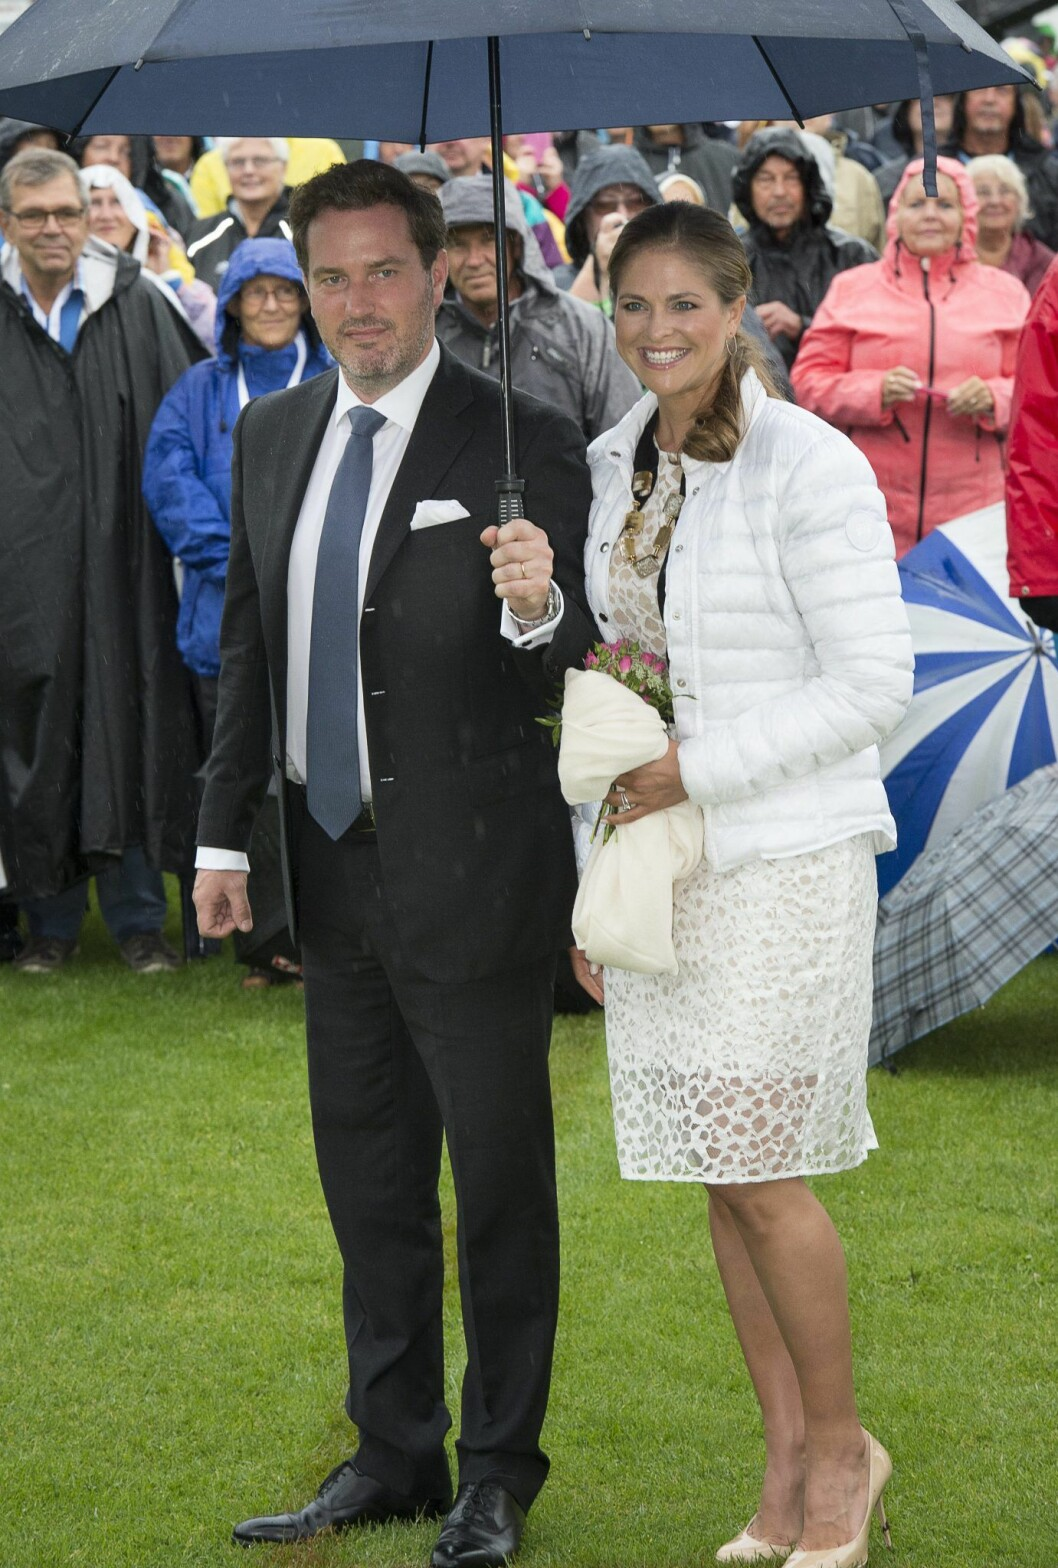 Prinsessan Madeleine och Chris under ett paraply